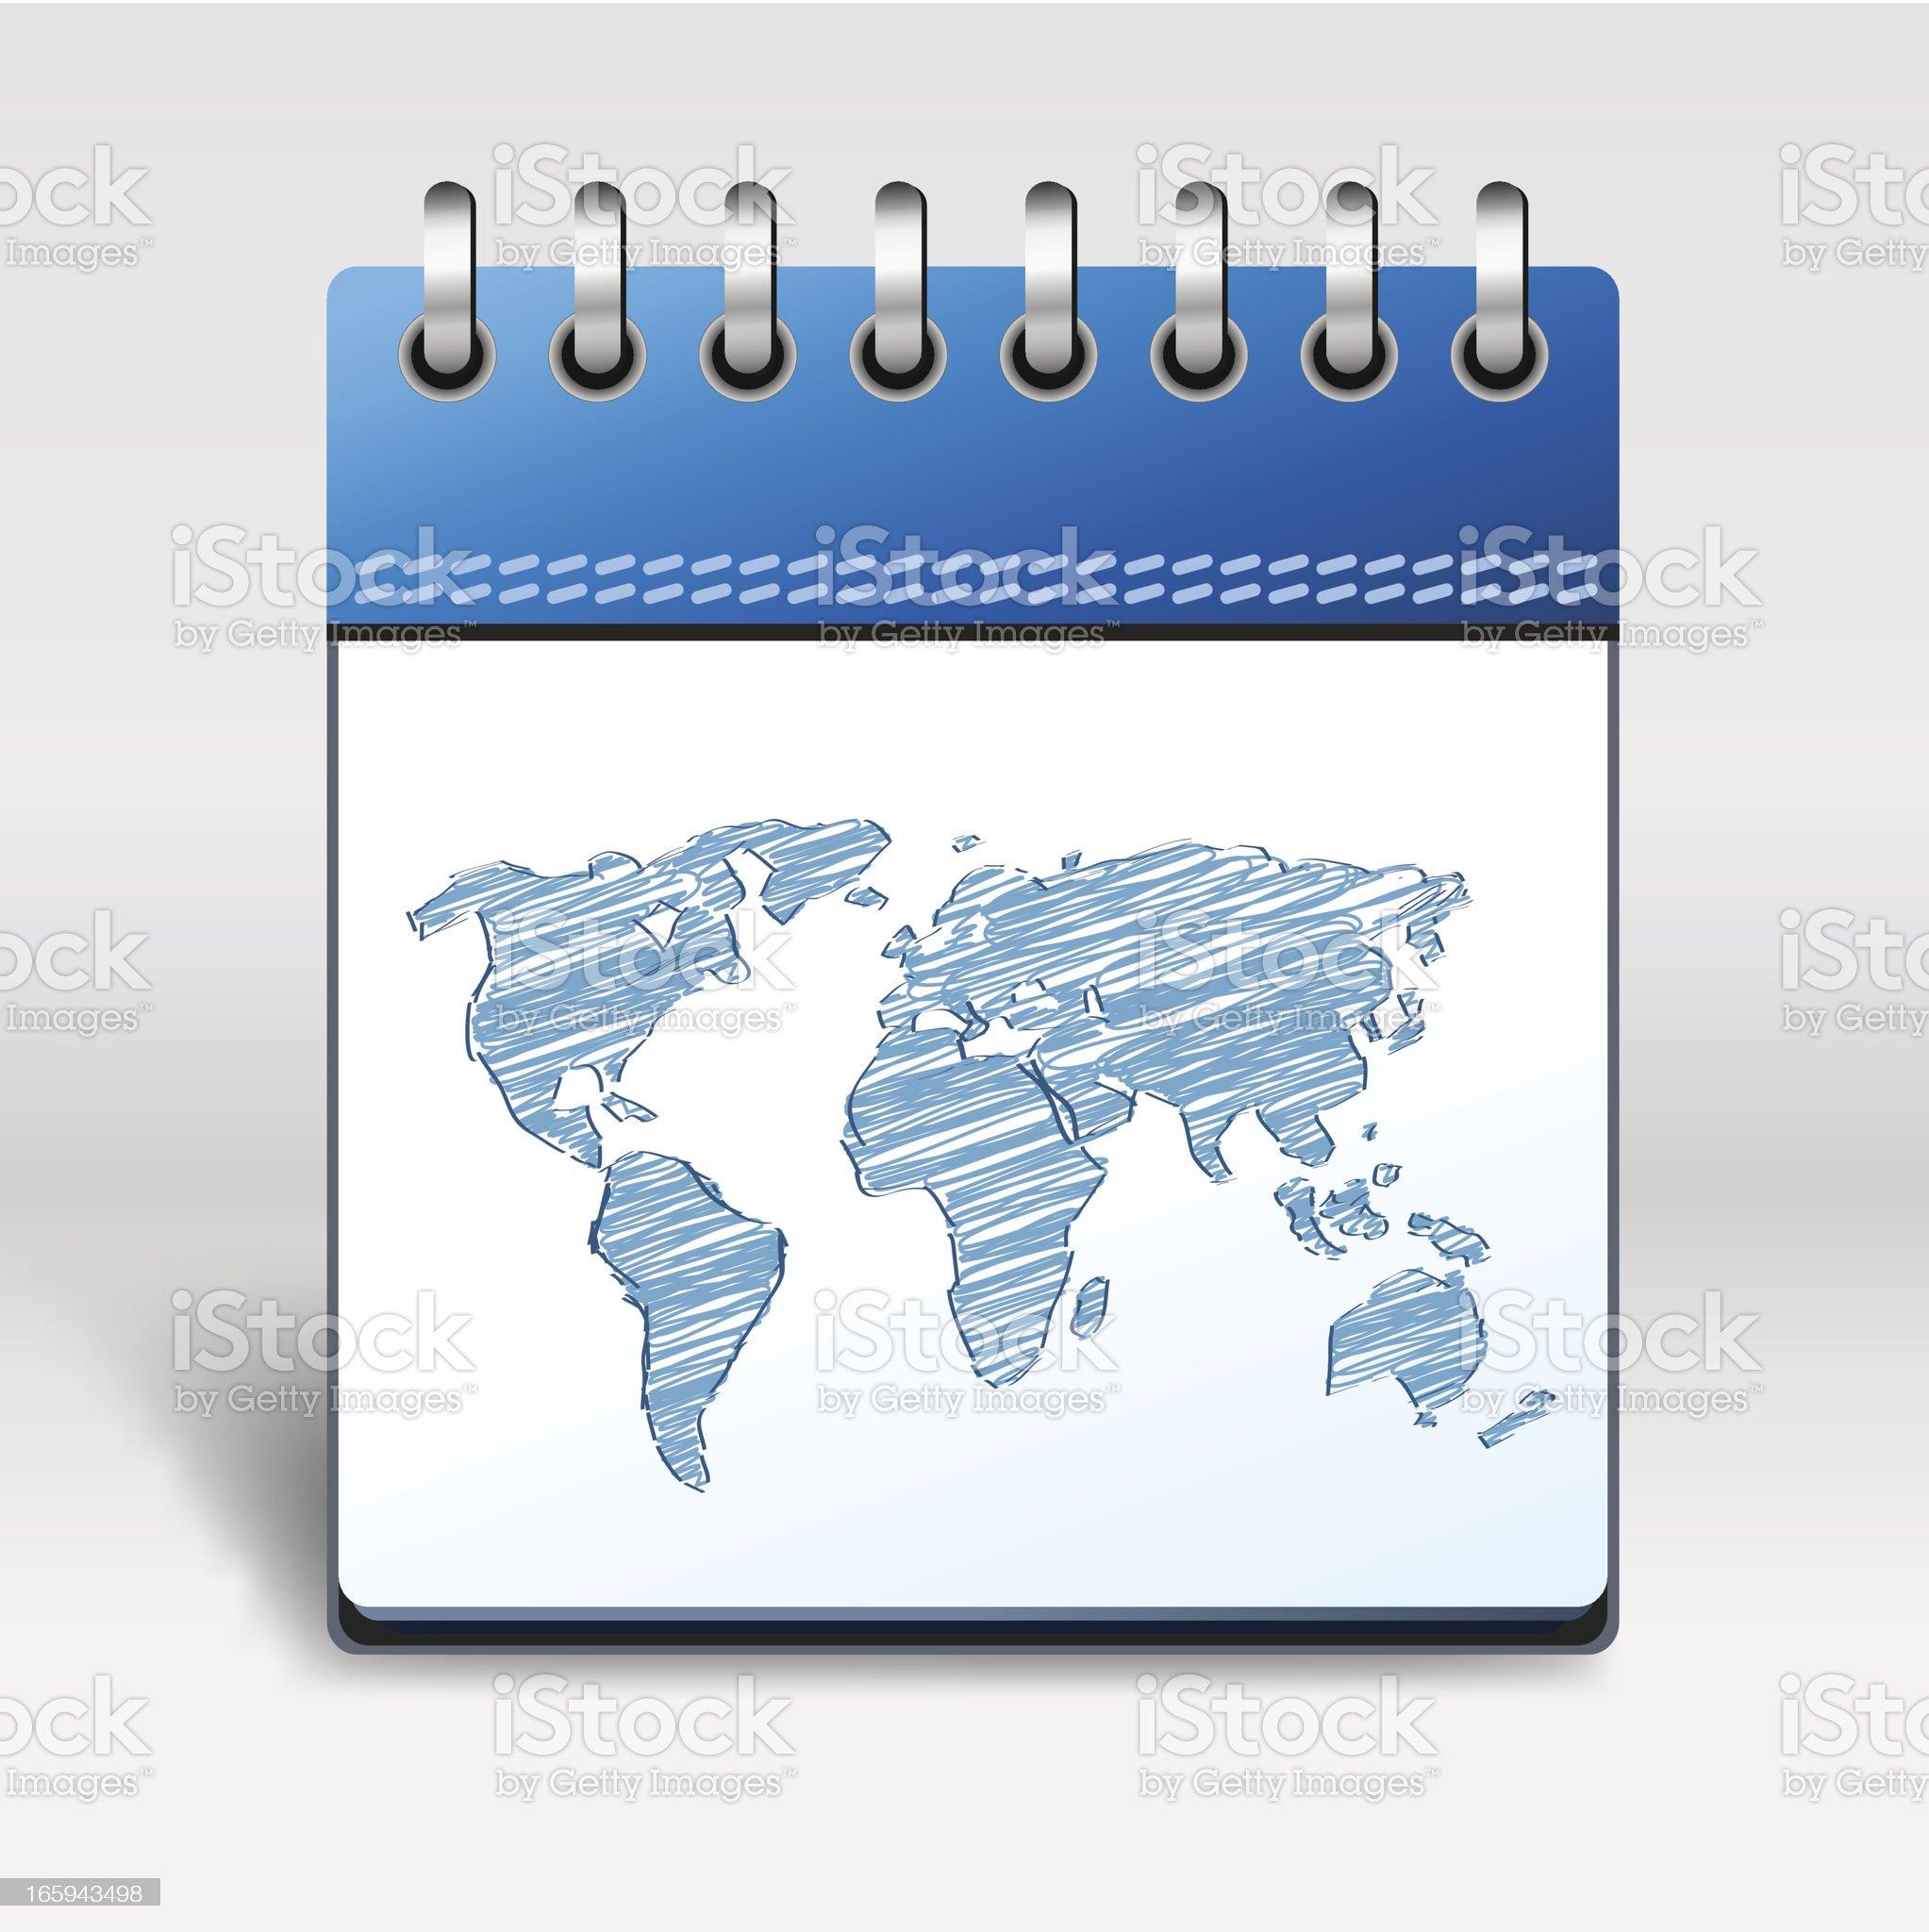 Calendar Icon world map royalty-free stock vector art